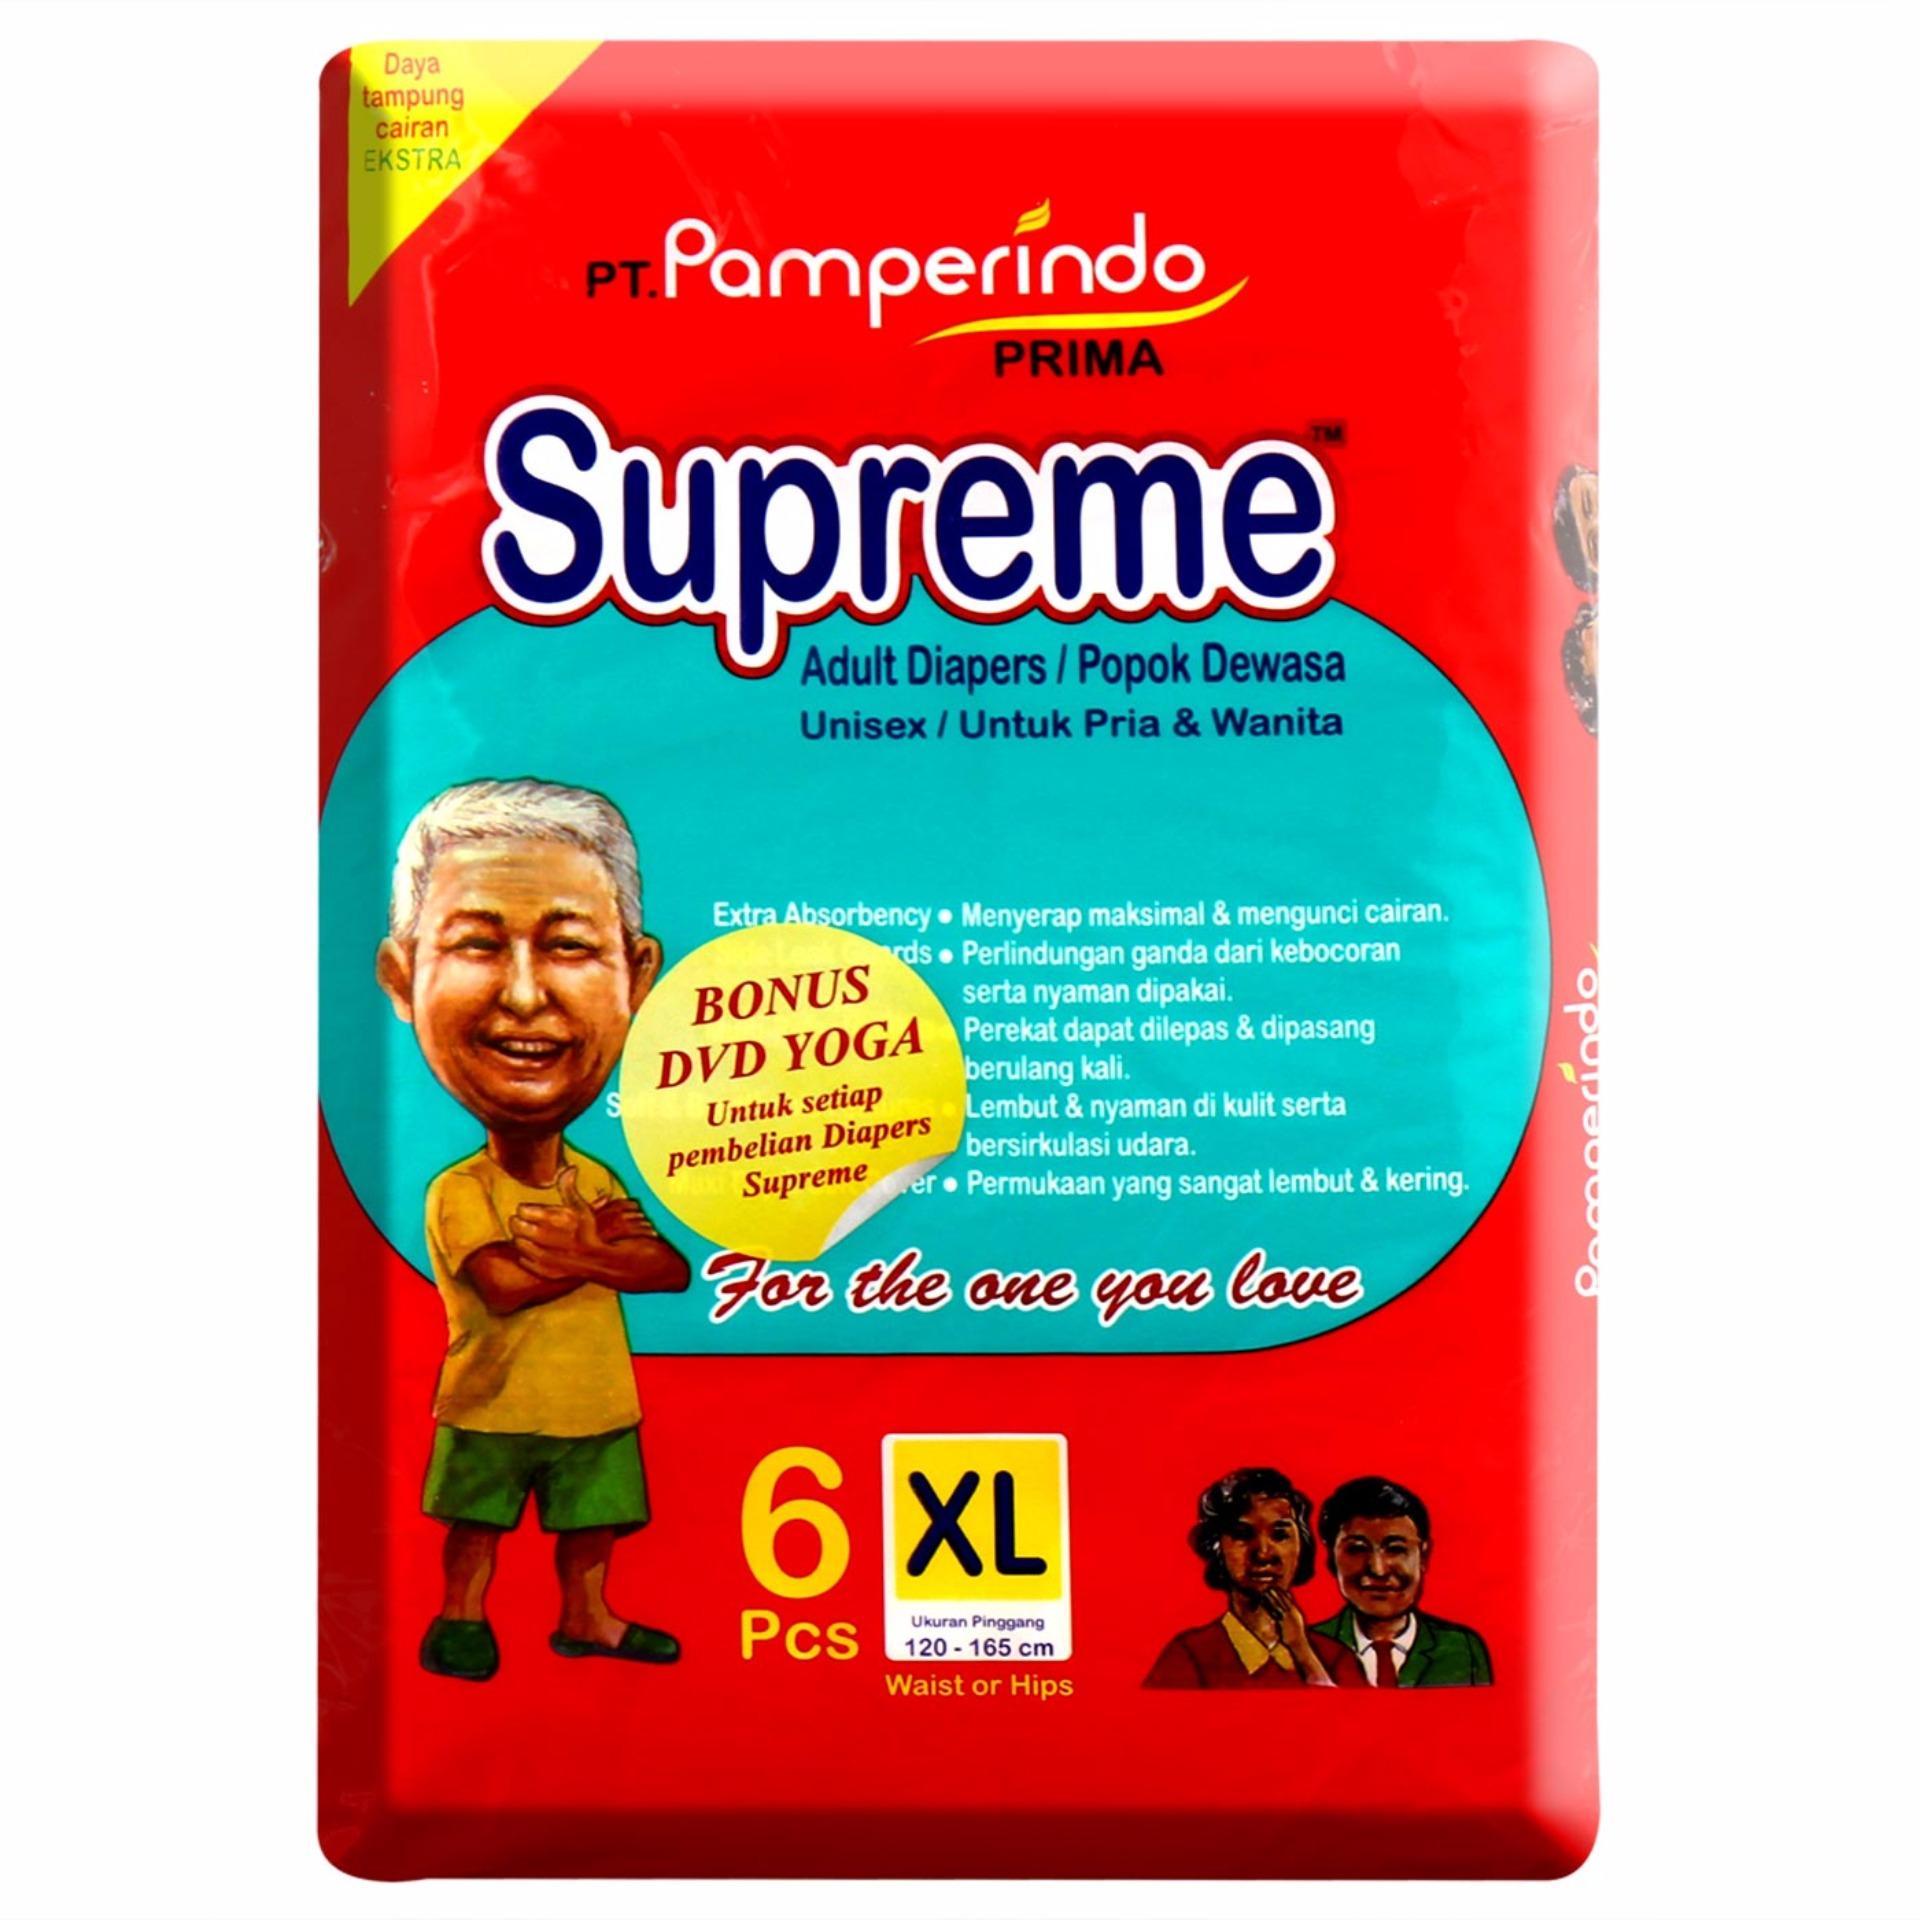 Pencari Harga Supreme Popok Dewasa Size Xl Isi 6pcs Paket 4 L 10pcs